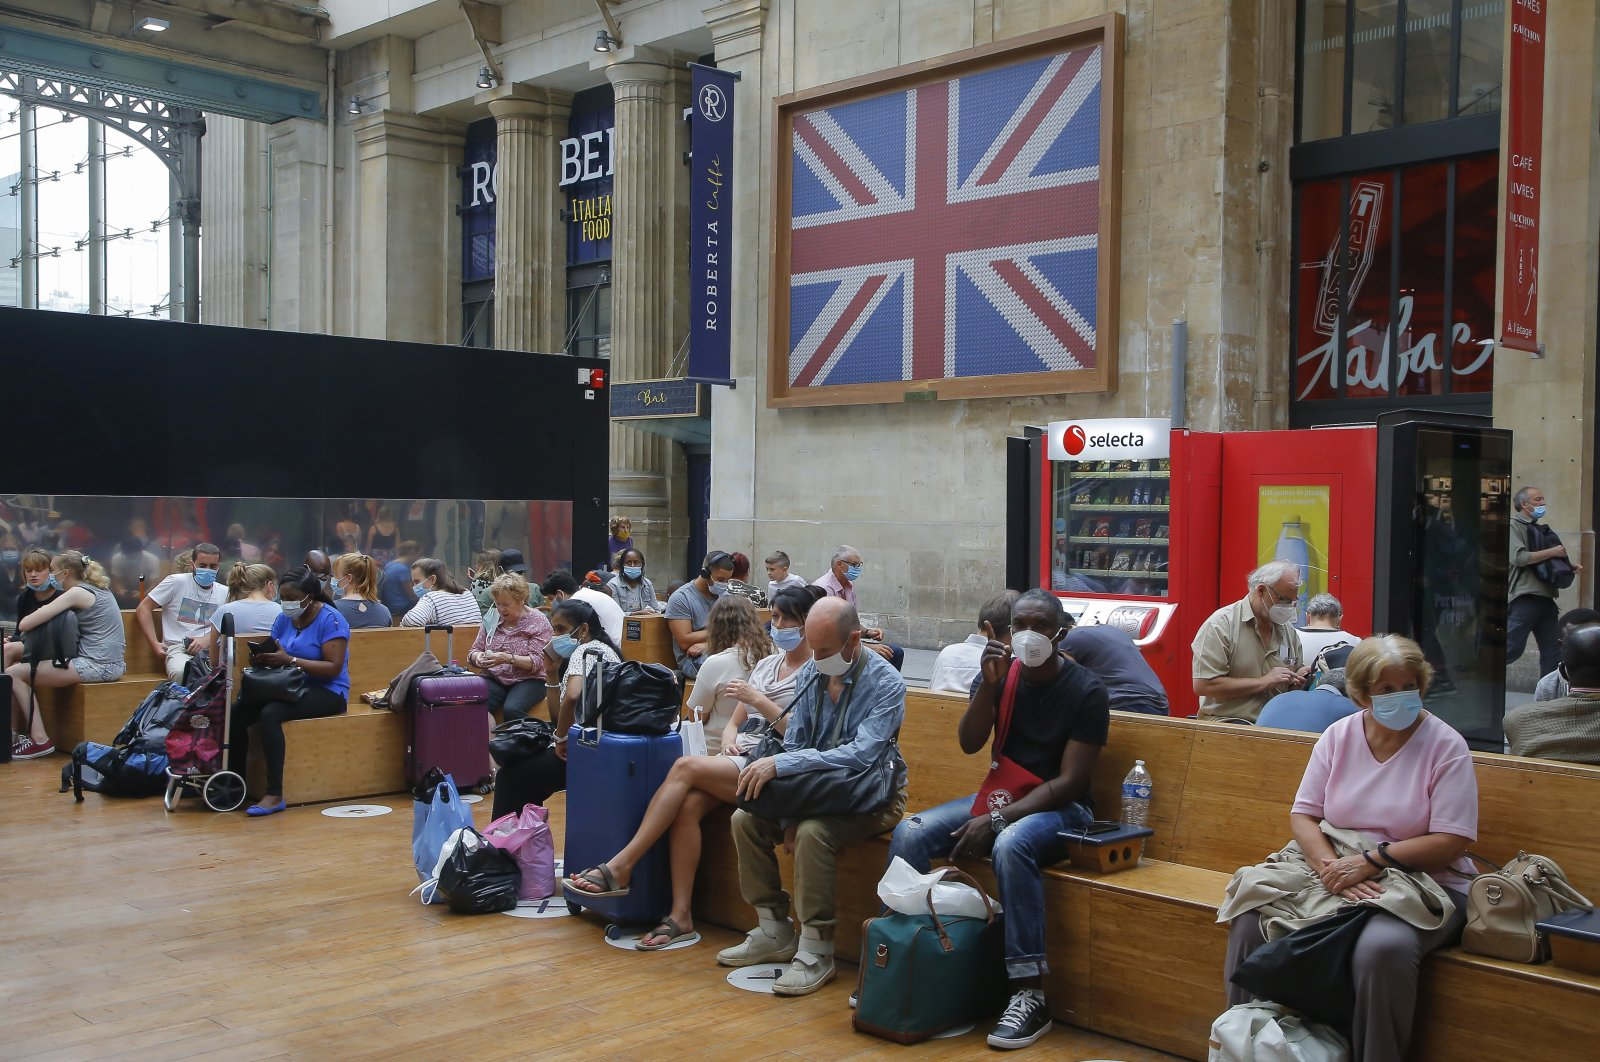 Passengers wait next to the Eurostar Terminal at the Gare du Nord train station, Paris, Aug. 14, 2020. (AP Photo)